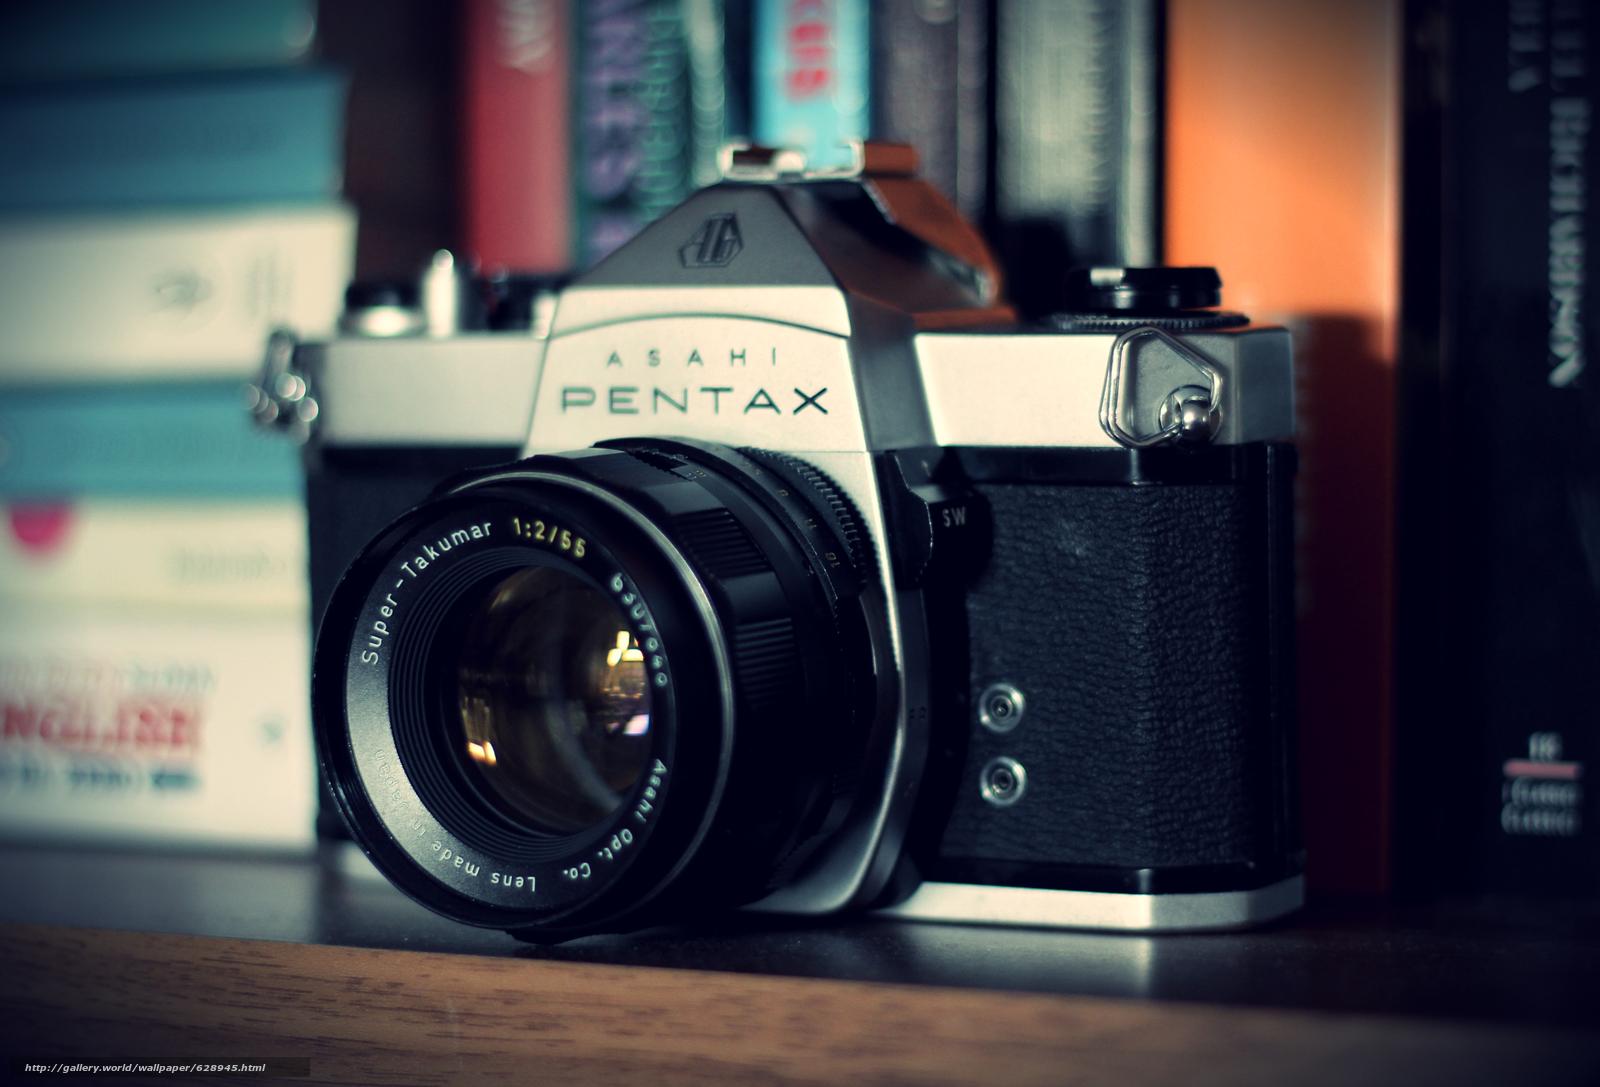 фотоаппарат, pentax, camera, камера, объектив, old